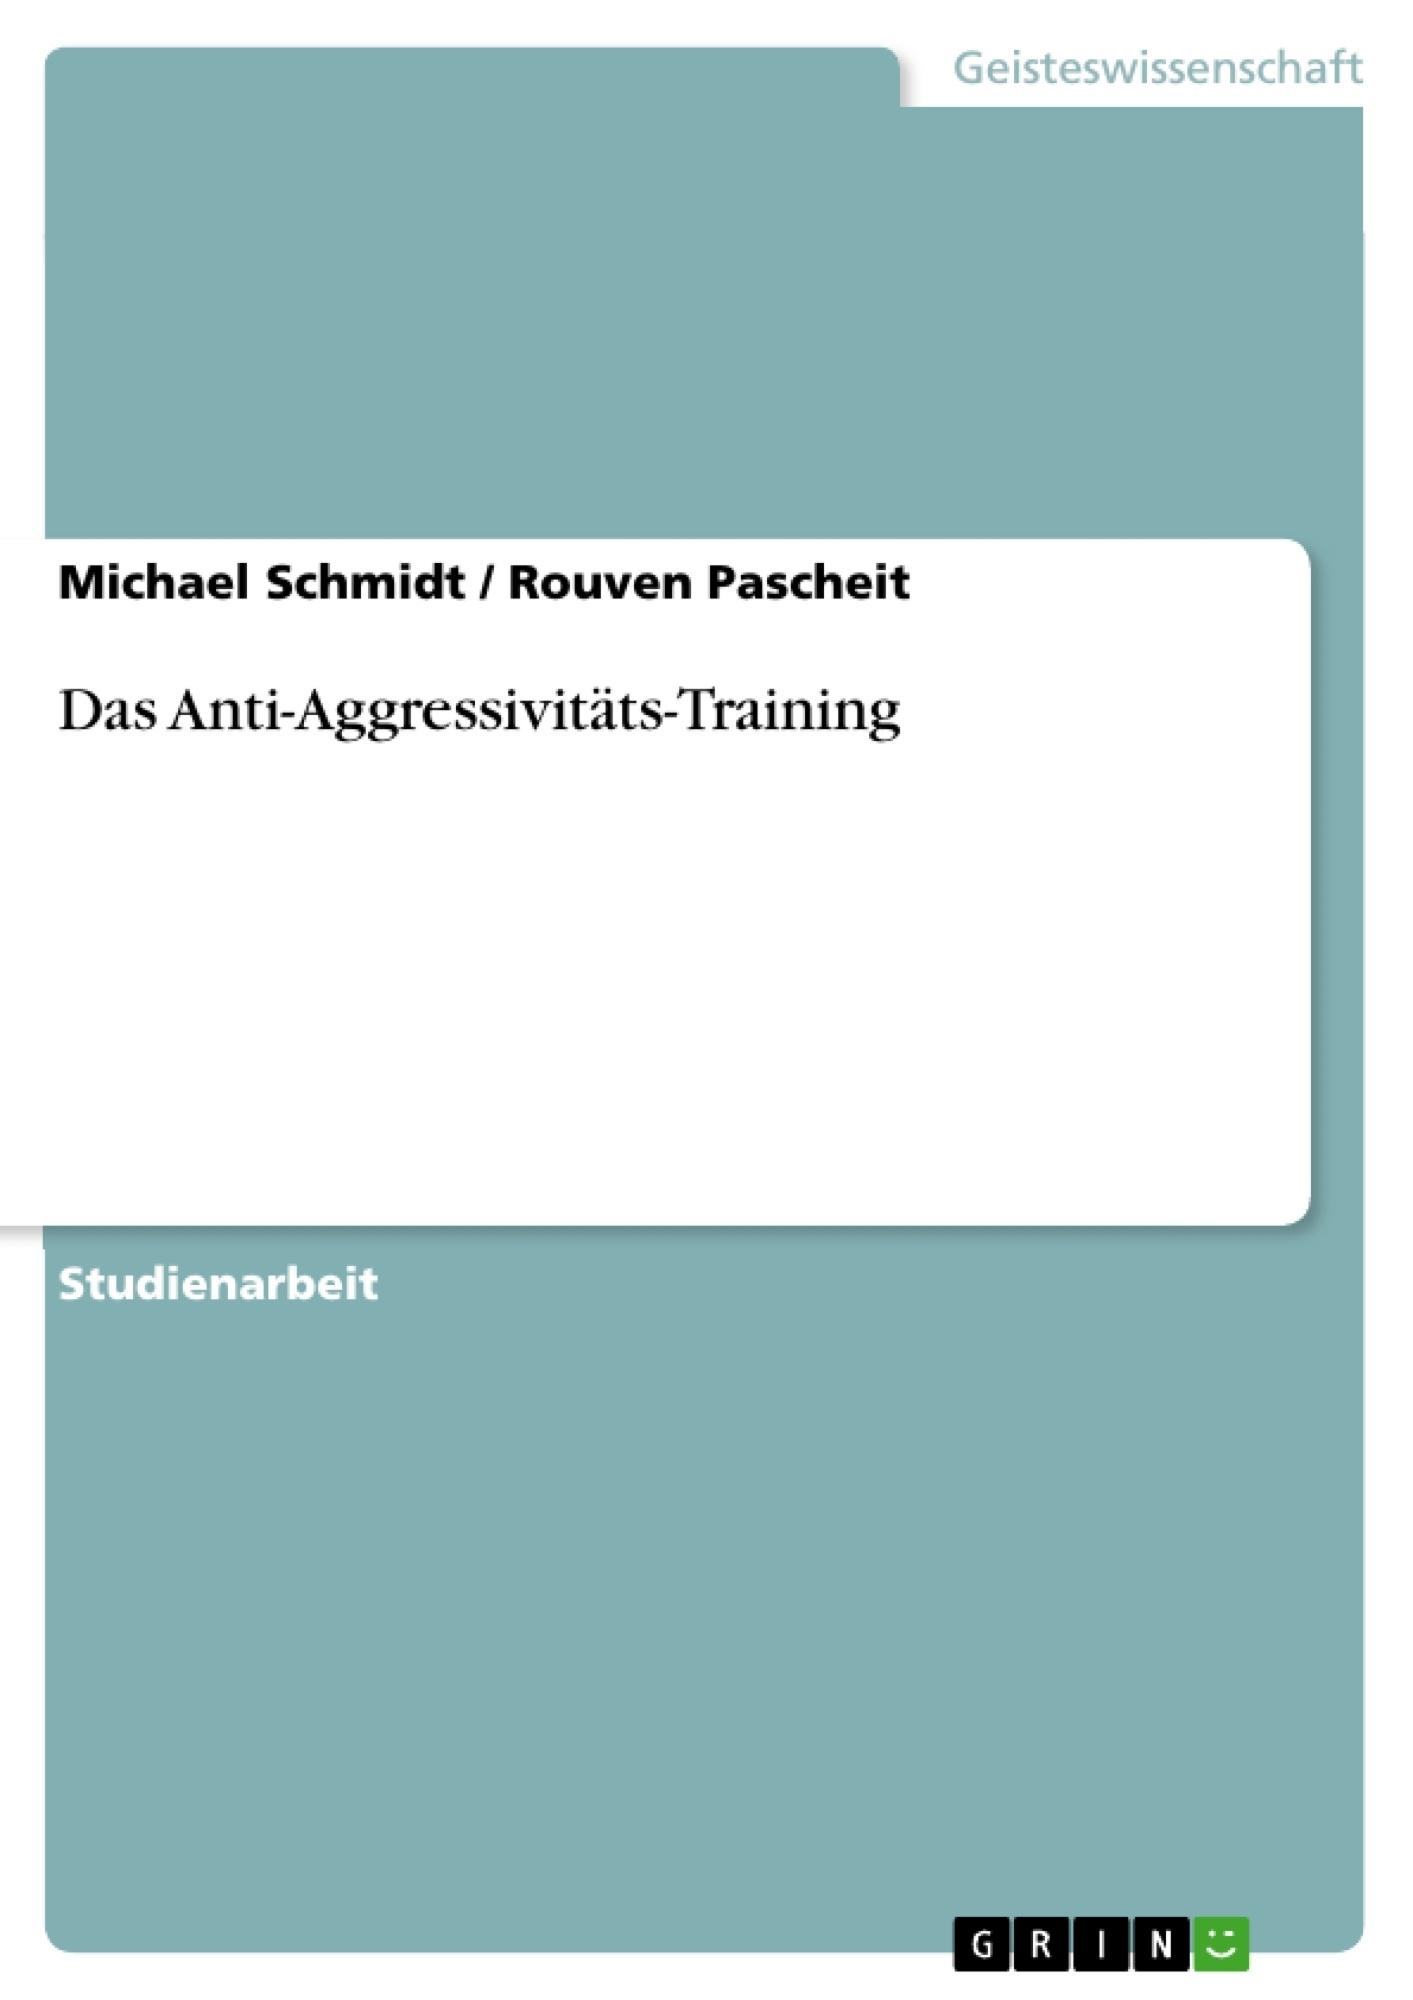 Titel: Das Anti-Aggressivitäts-Training